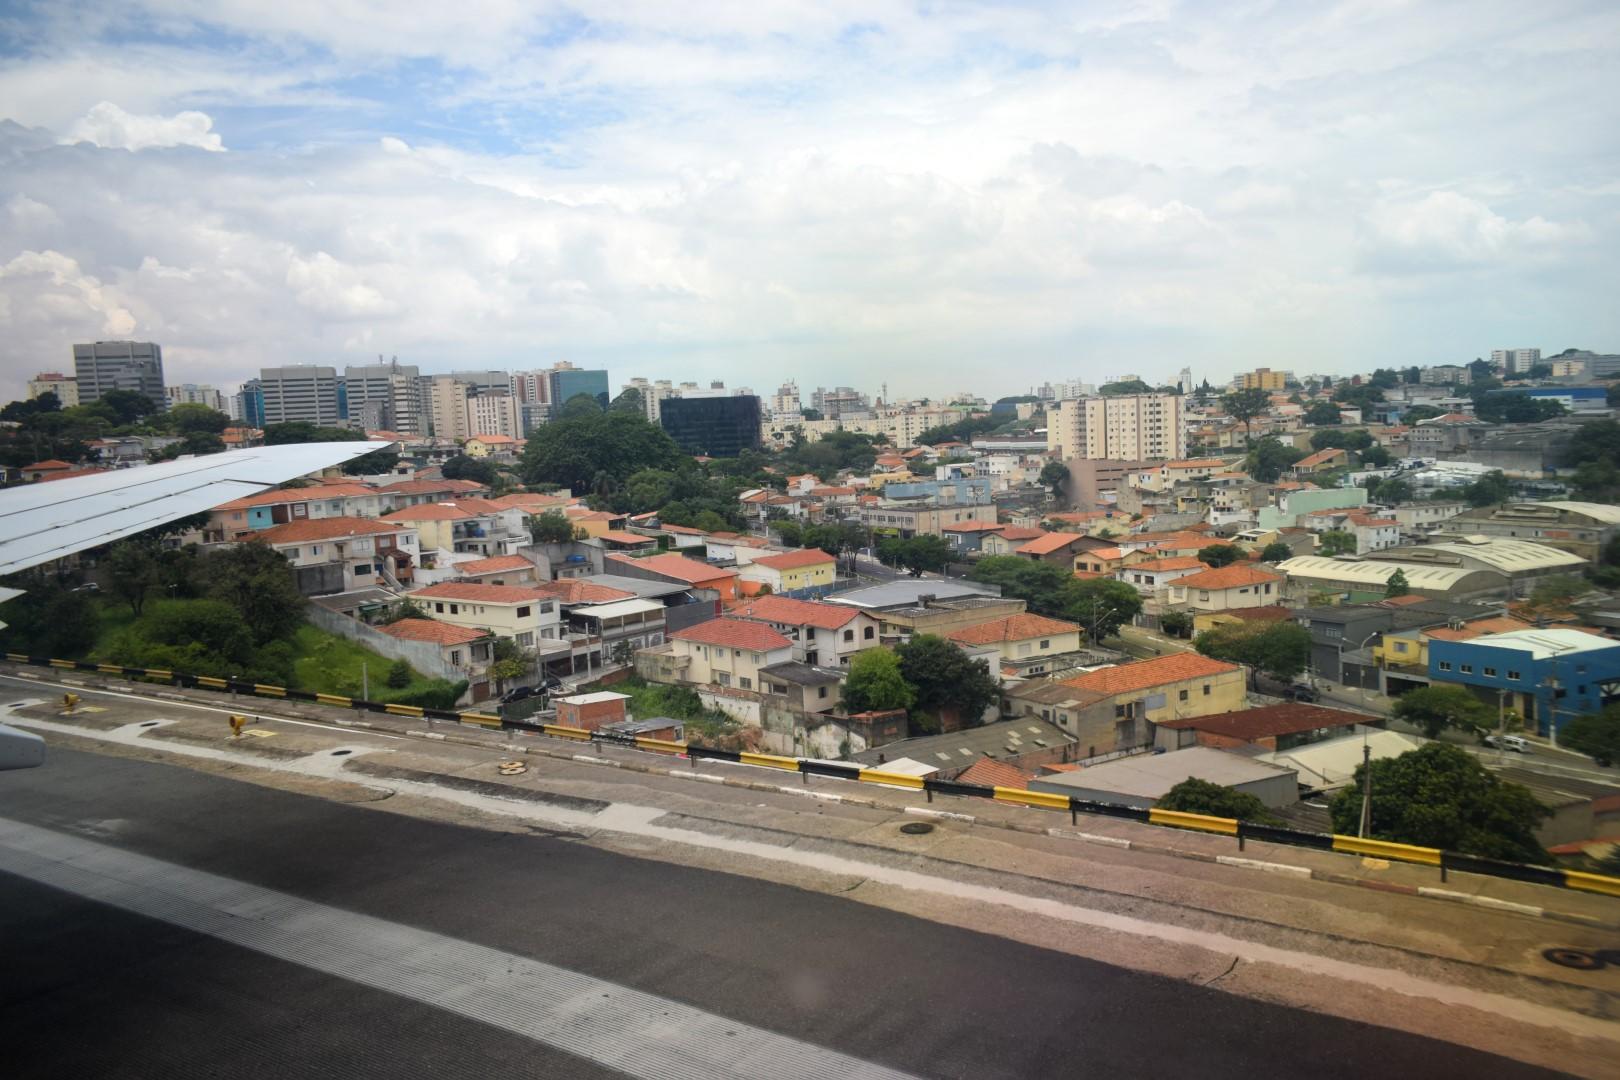 Taking off in Congonhas Airport, São Paulo